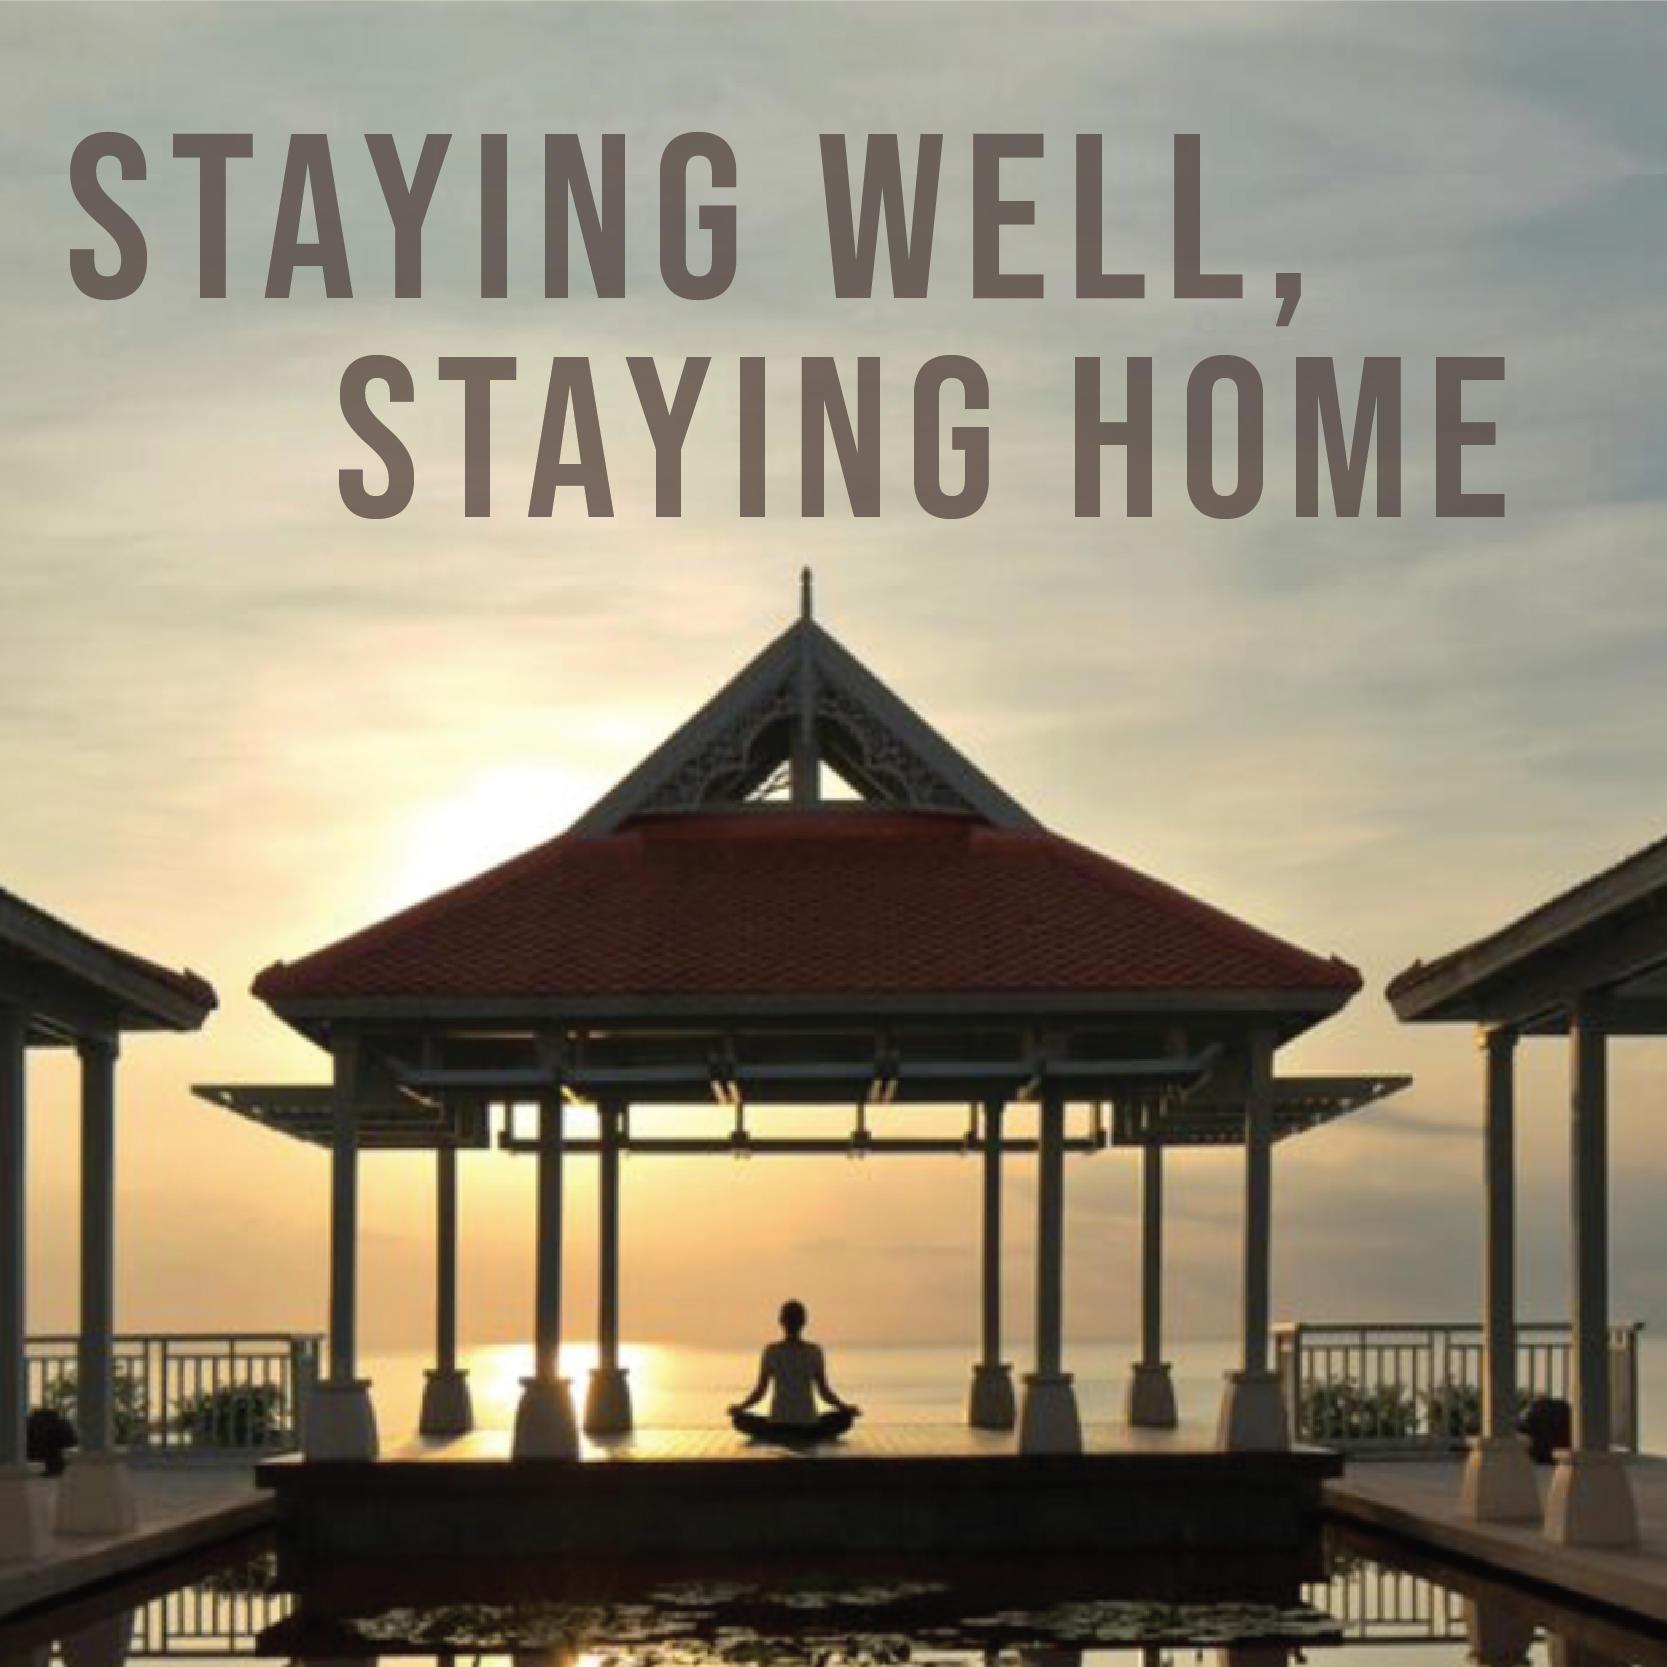 Staying well, staying home  - Amatara Wellness Resort